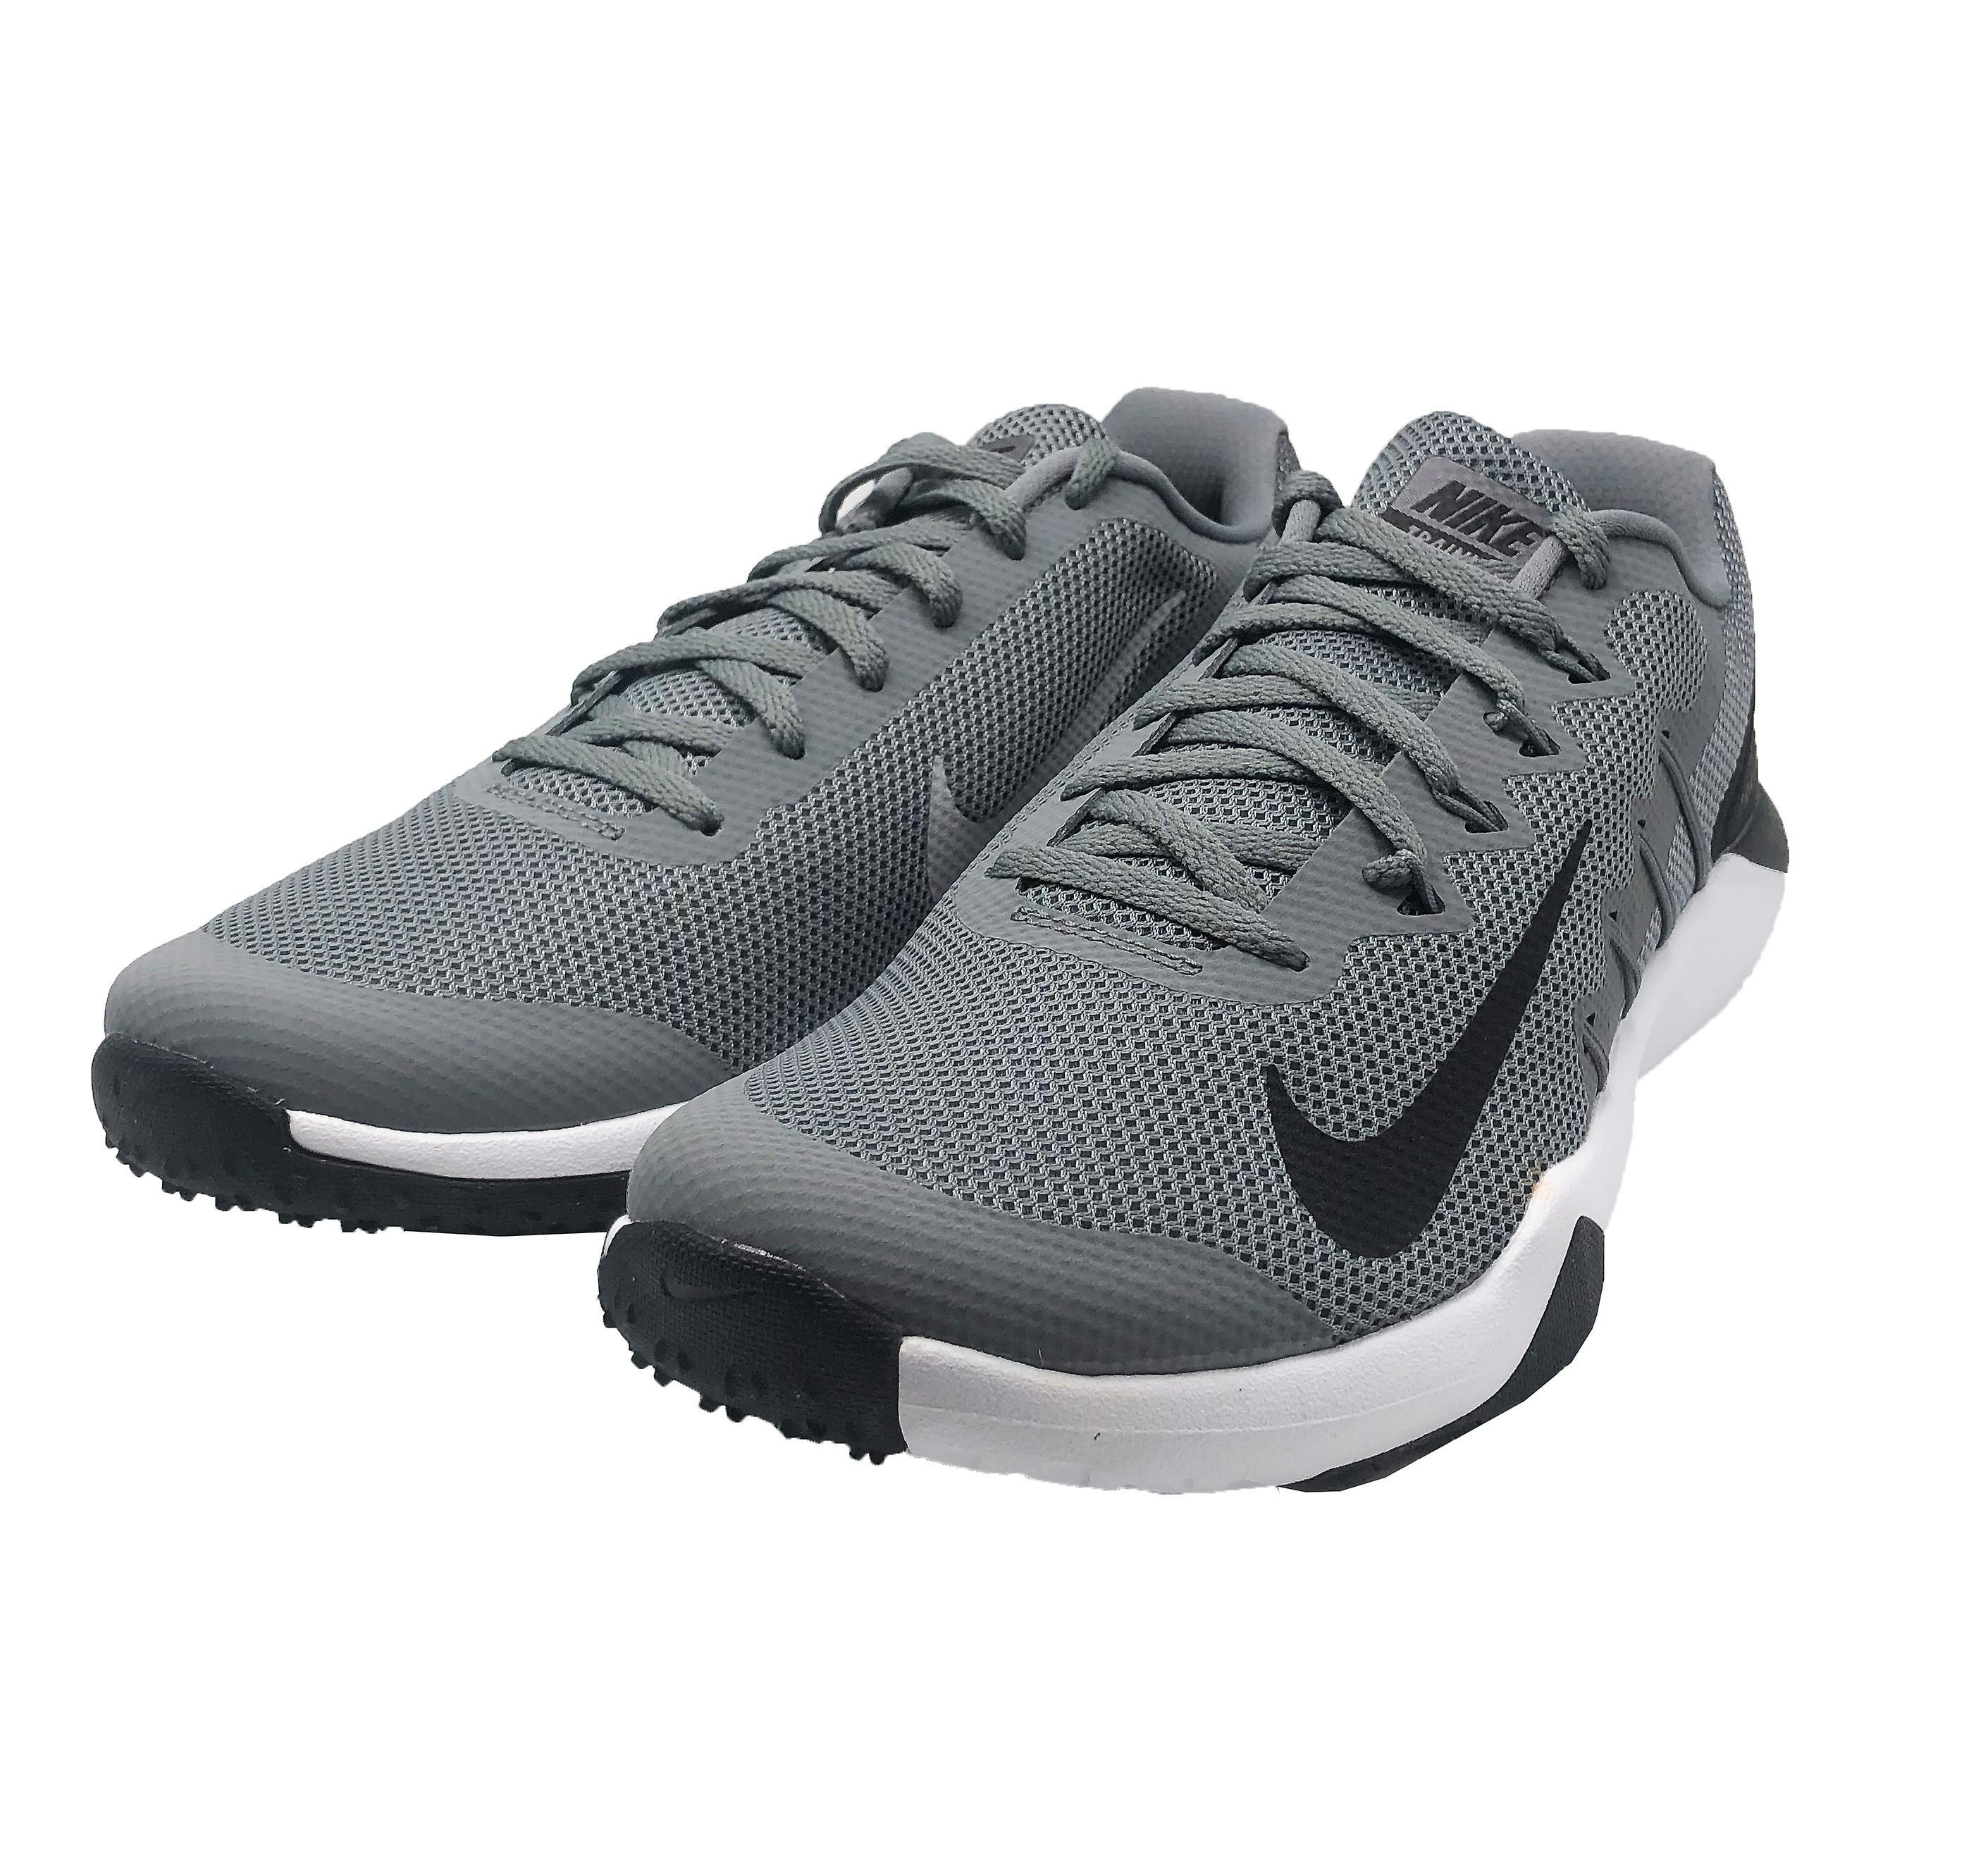 Nike Retaliation TR 2 AA7063 020 Mens Trainer